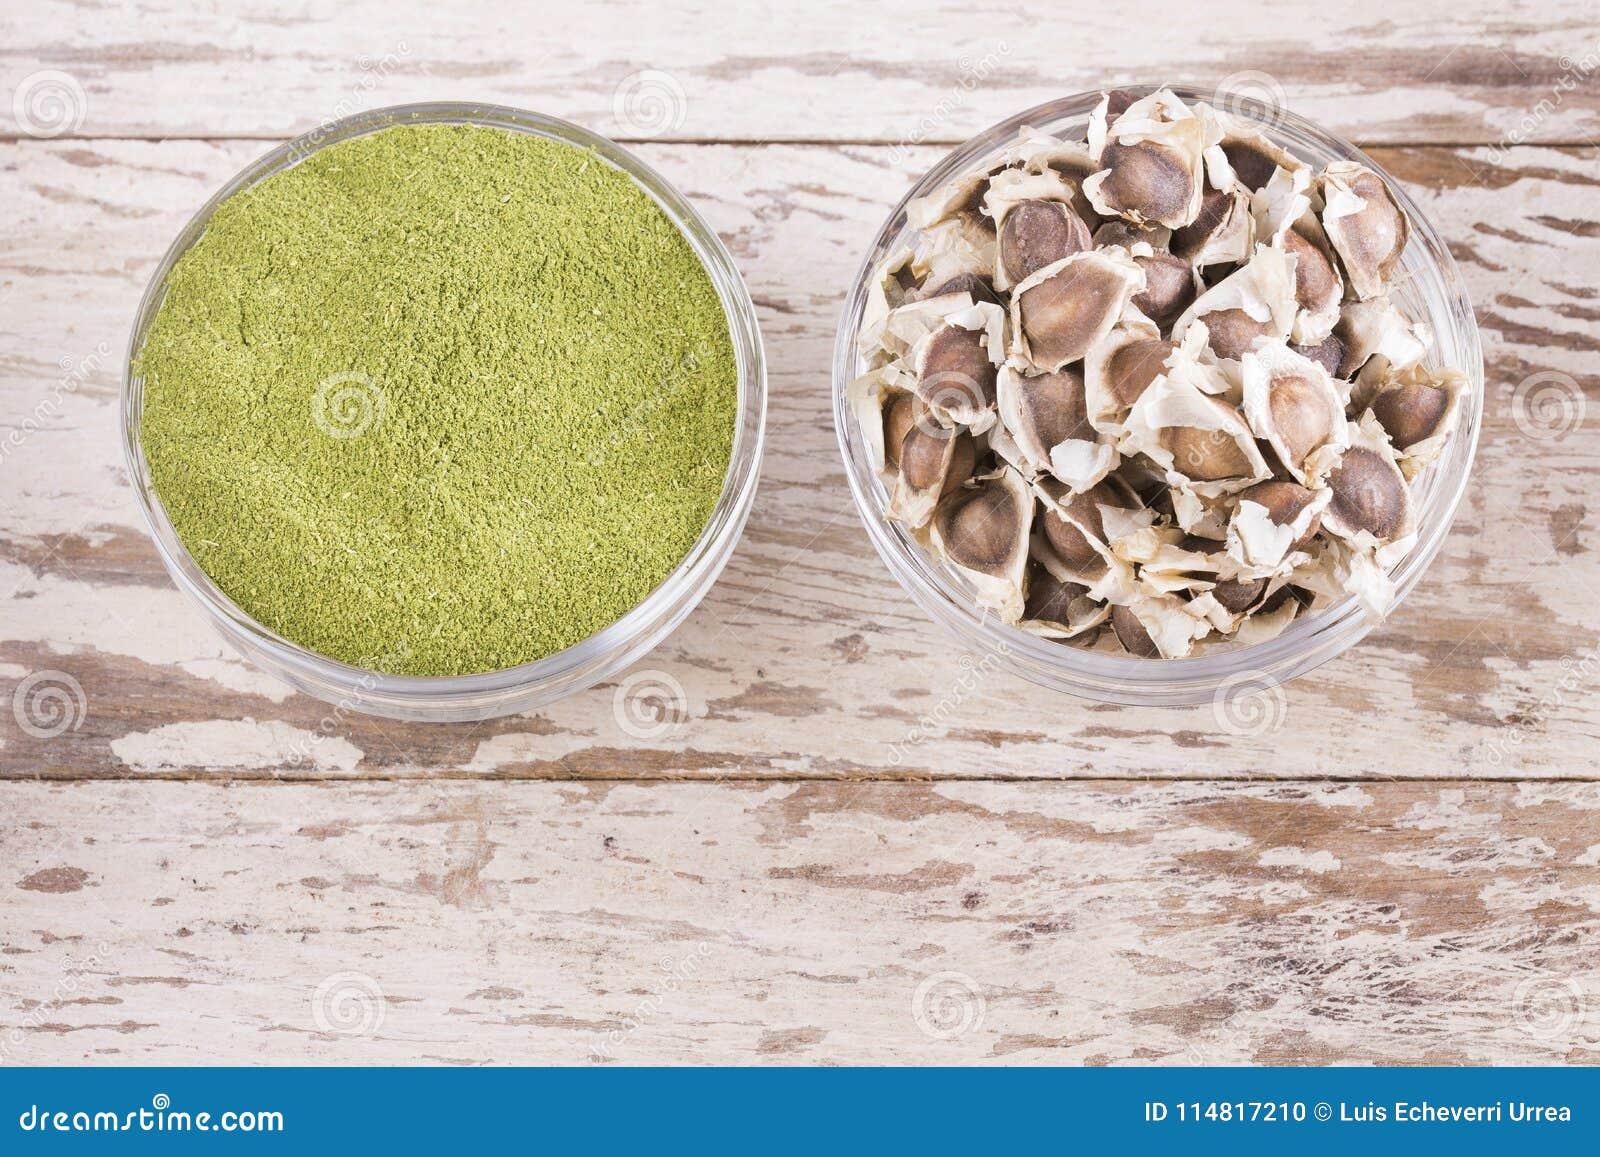 Moringa Seeds And Powder - Moringa Oleifera Stock Photo